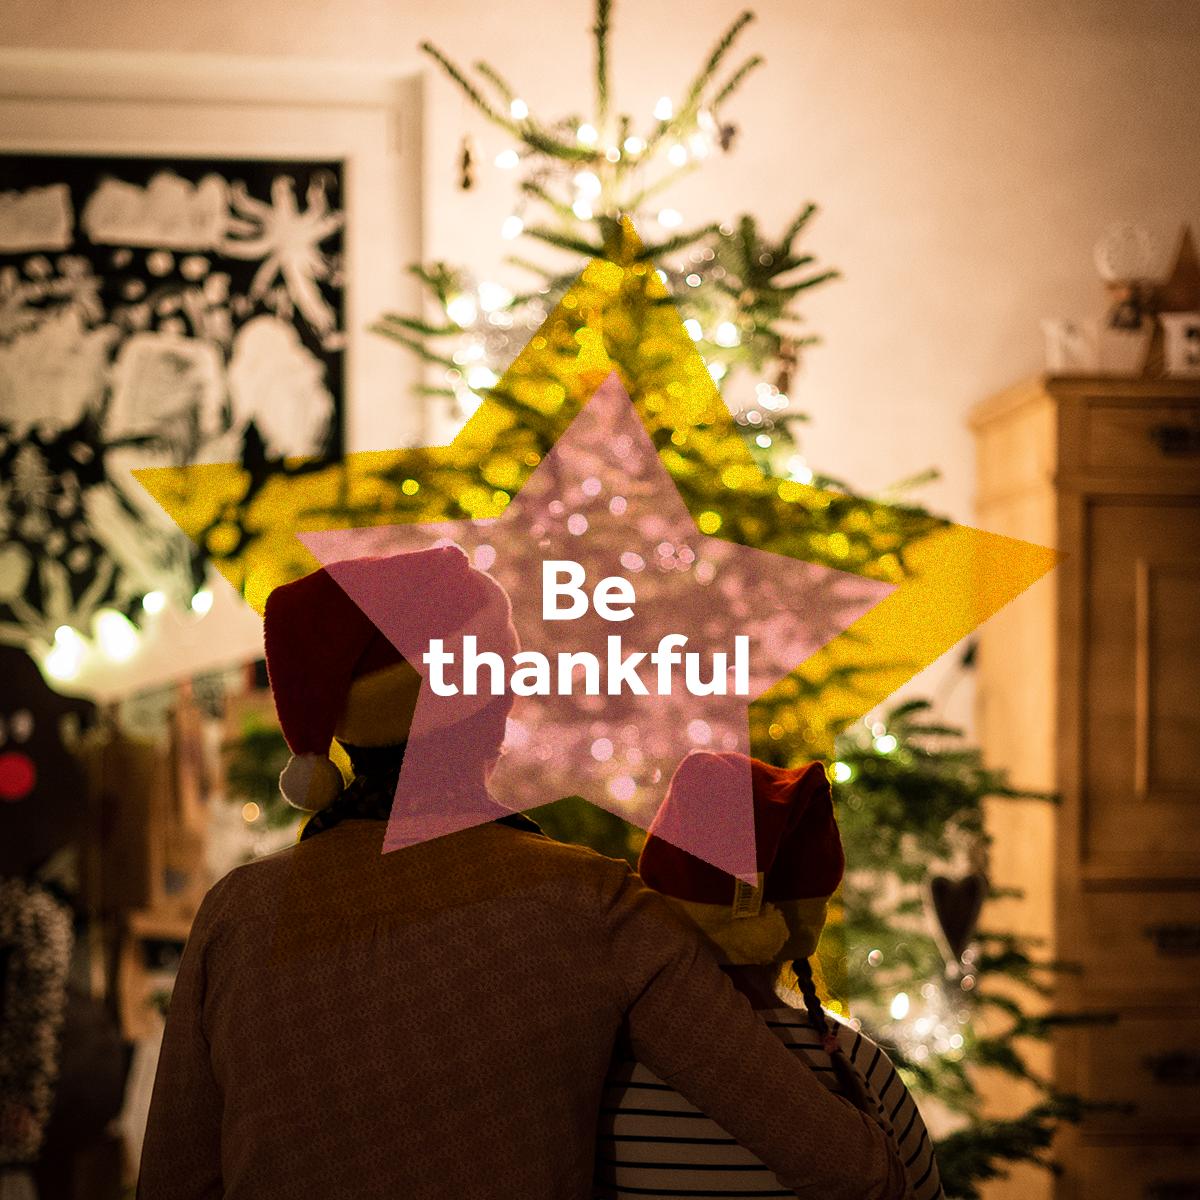 Festive Spirit - be thankful